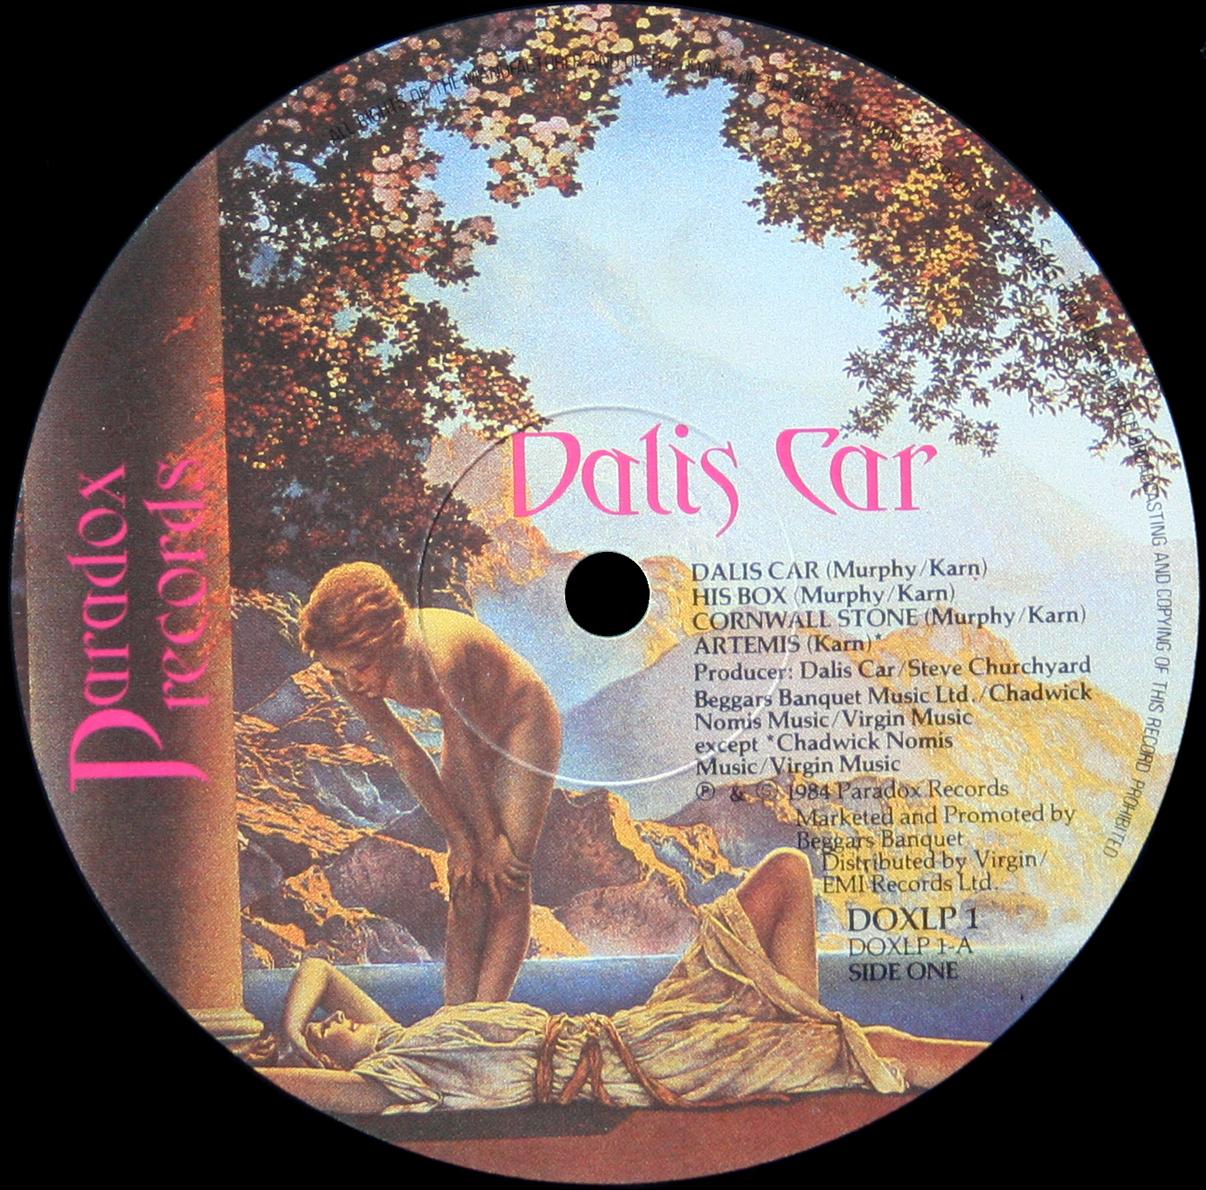 Dalis Car The Waking Hour LP Bauhaus Japan Maxfield Parrish